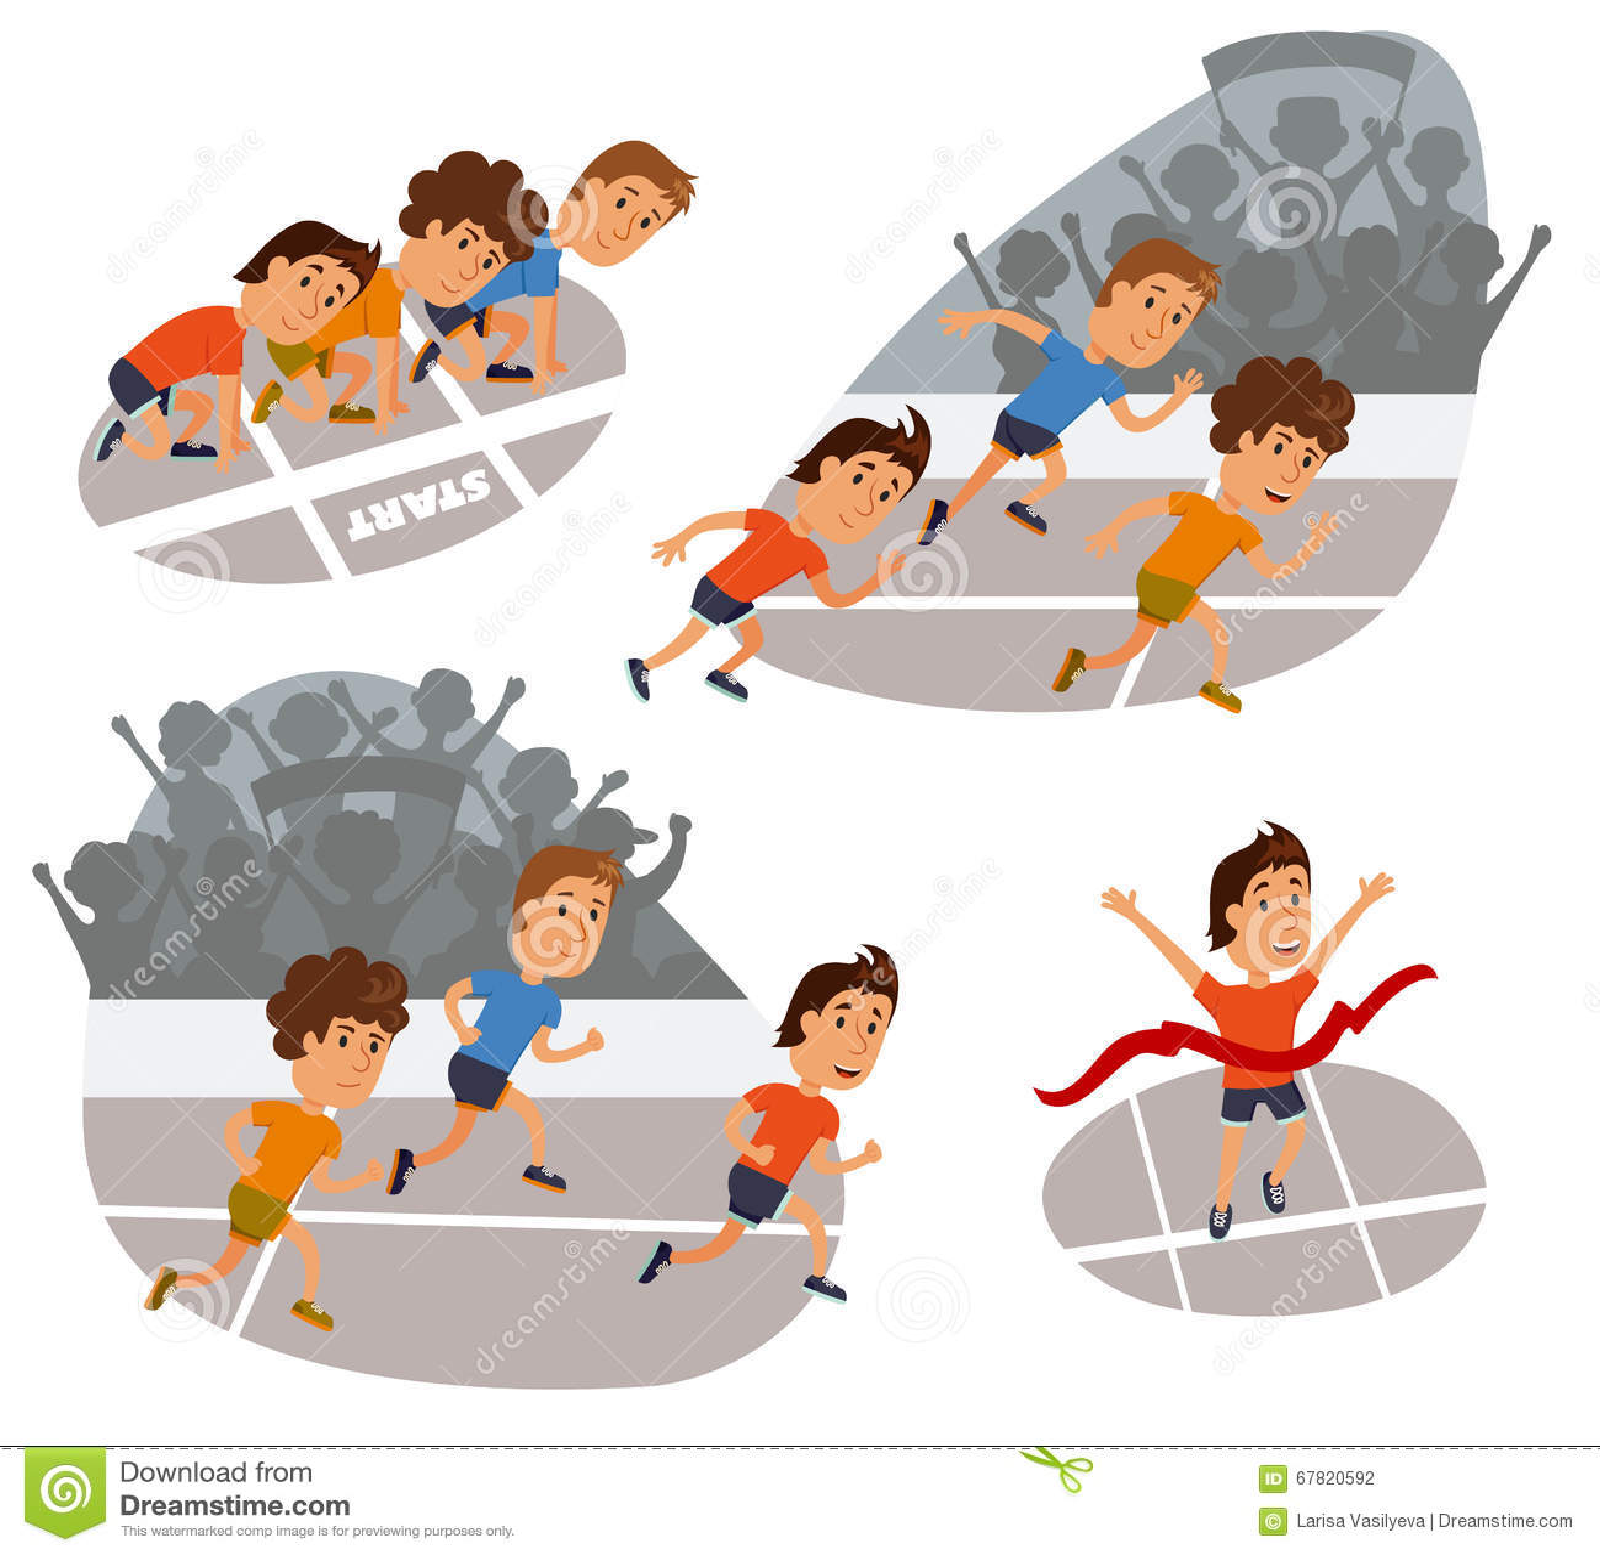 Kids Run Finish Line Animated Images